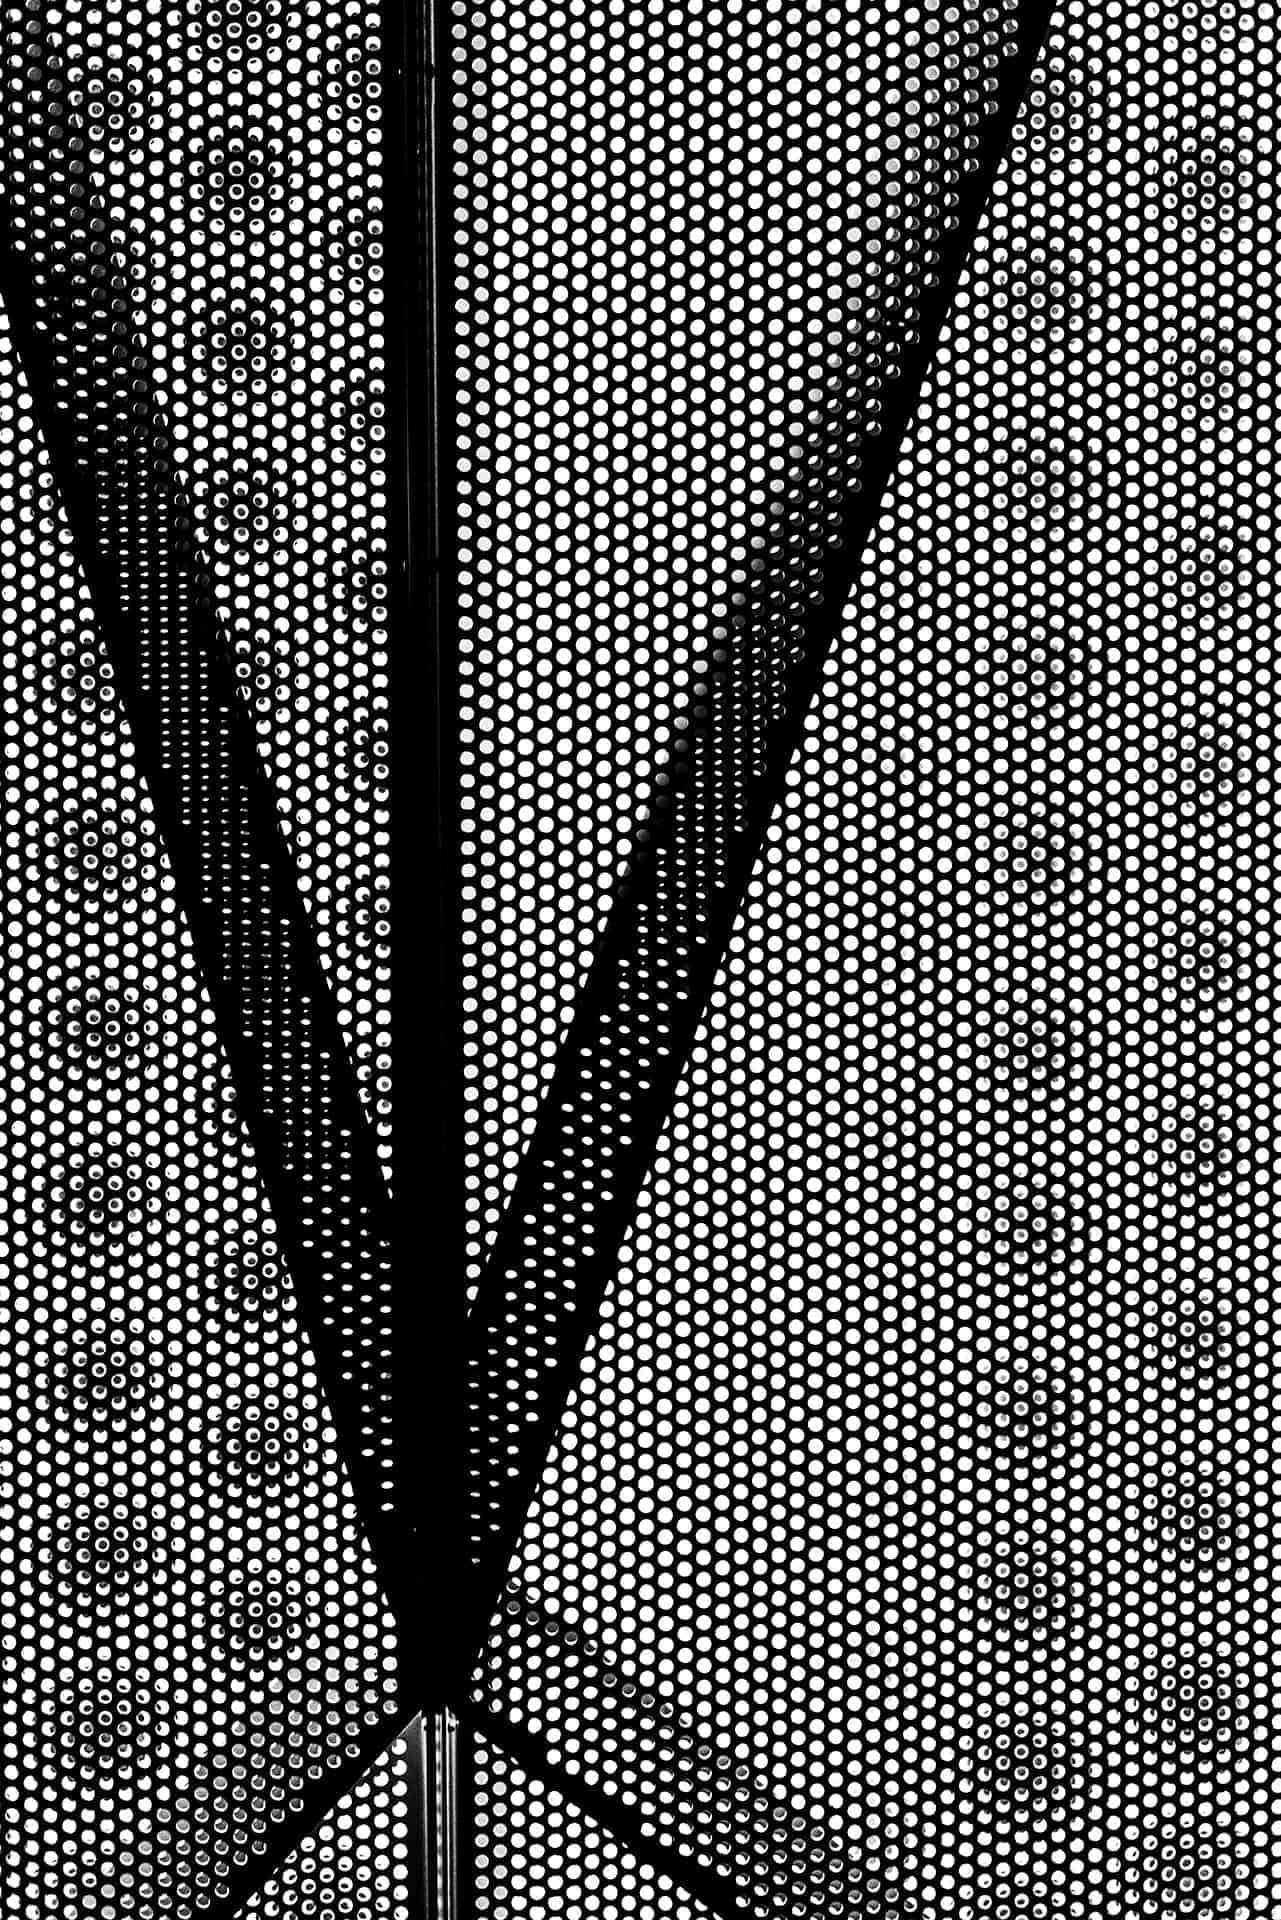 artnorama - Gross Grid